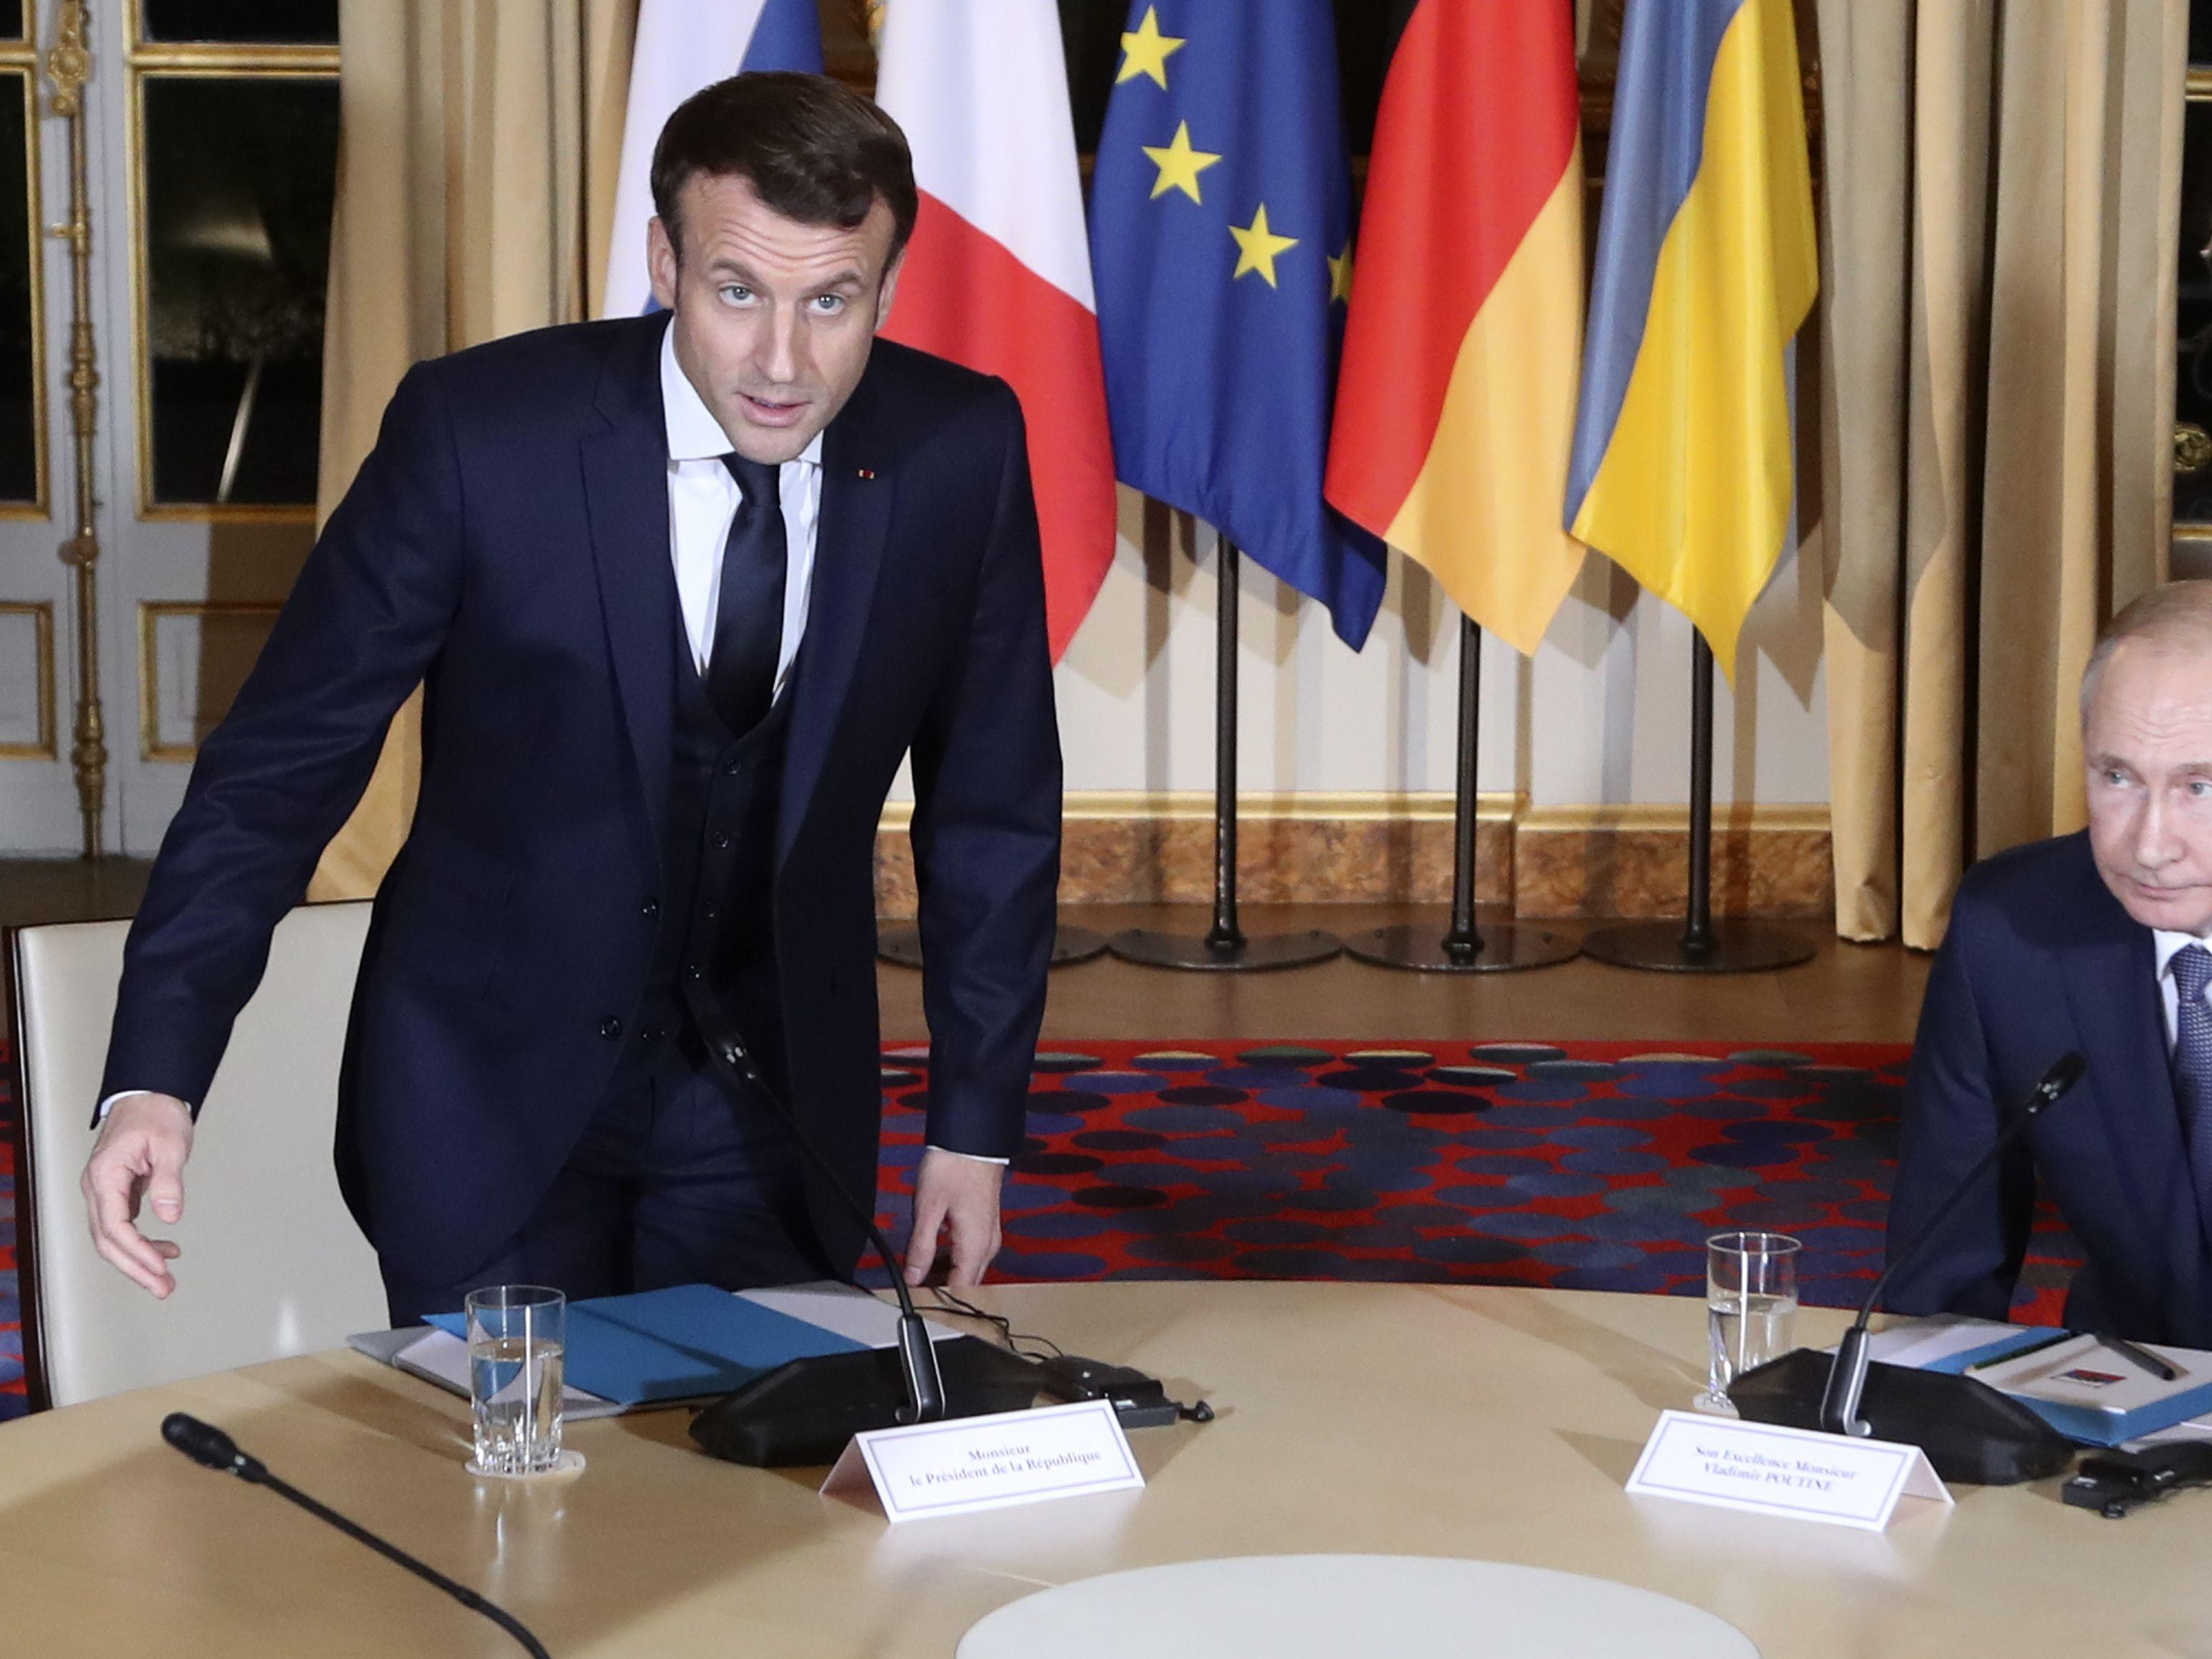 Russia, Ukraine to revive peace process amid little progress